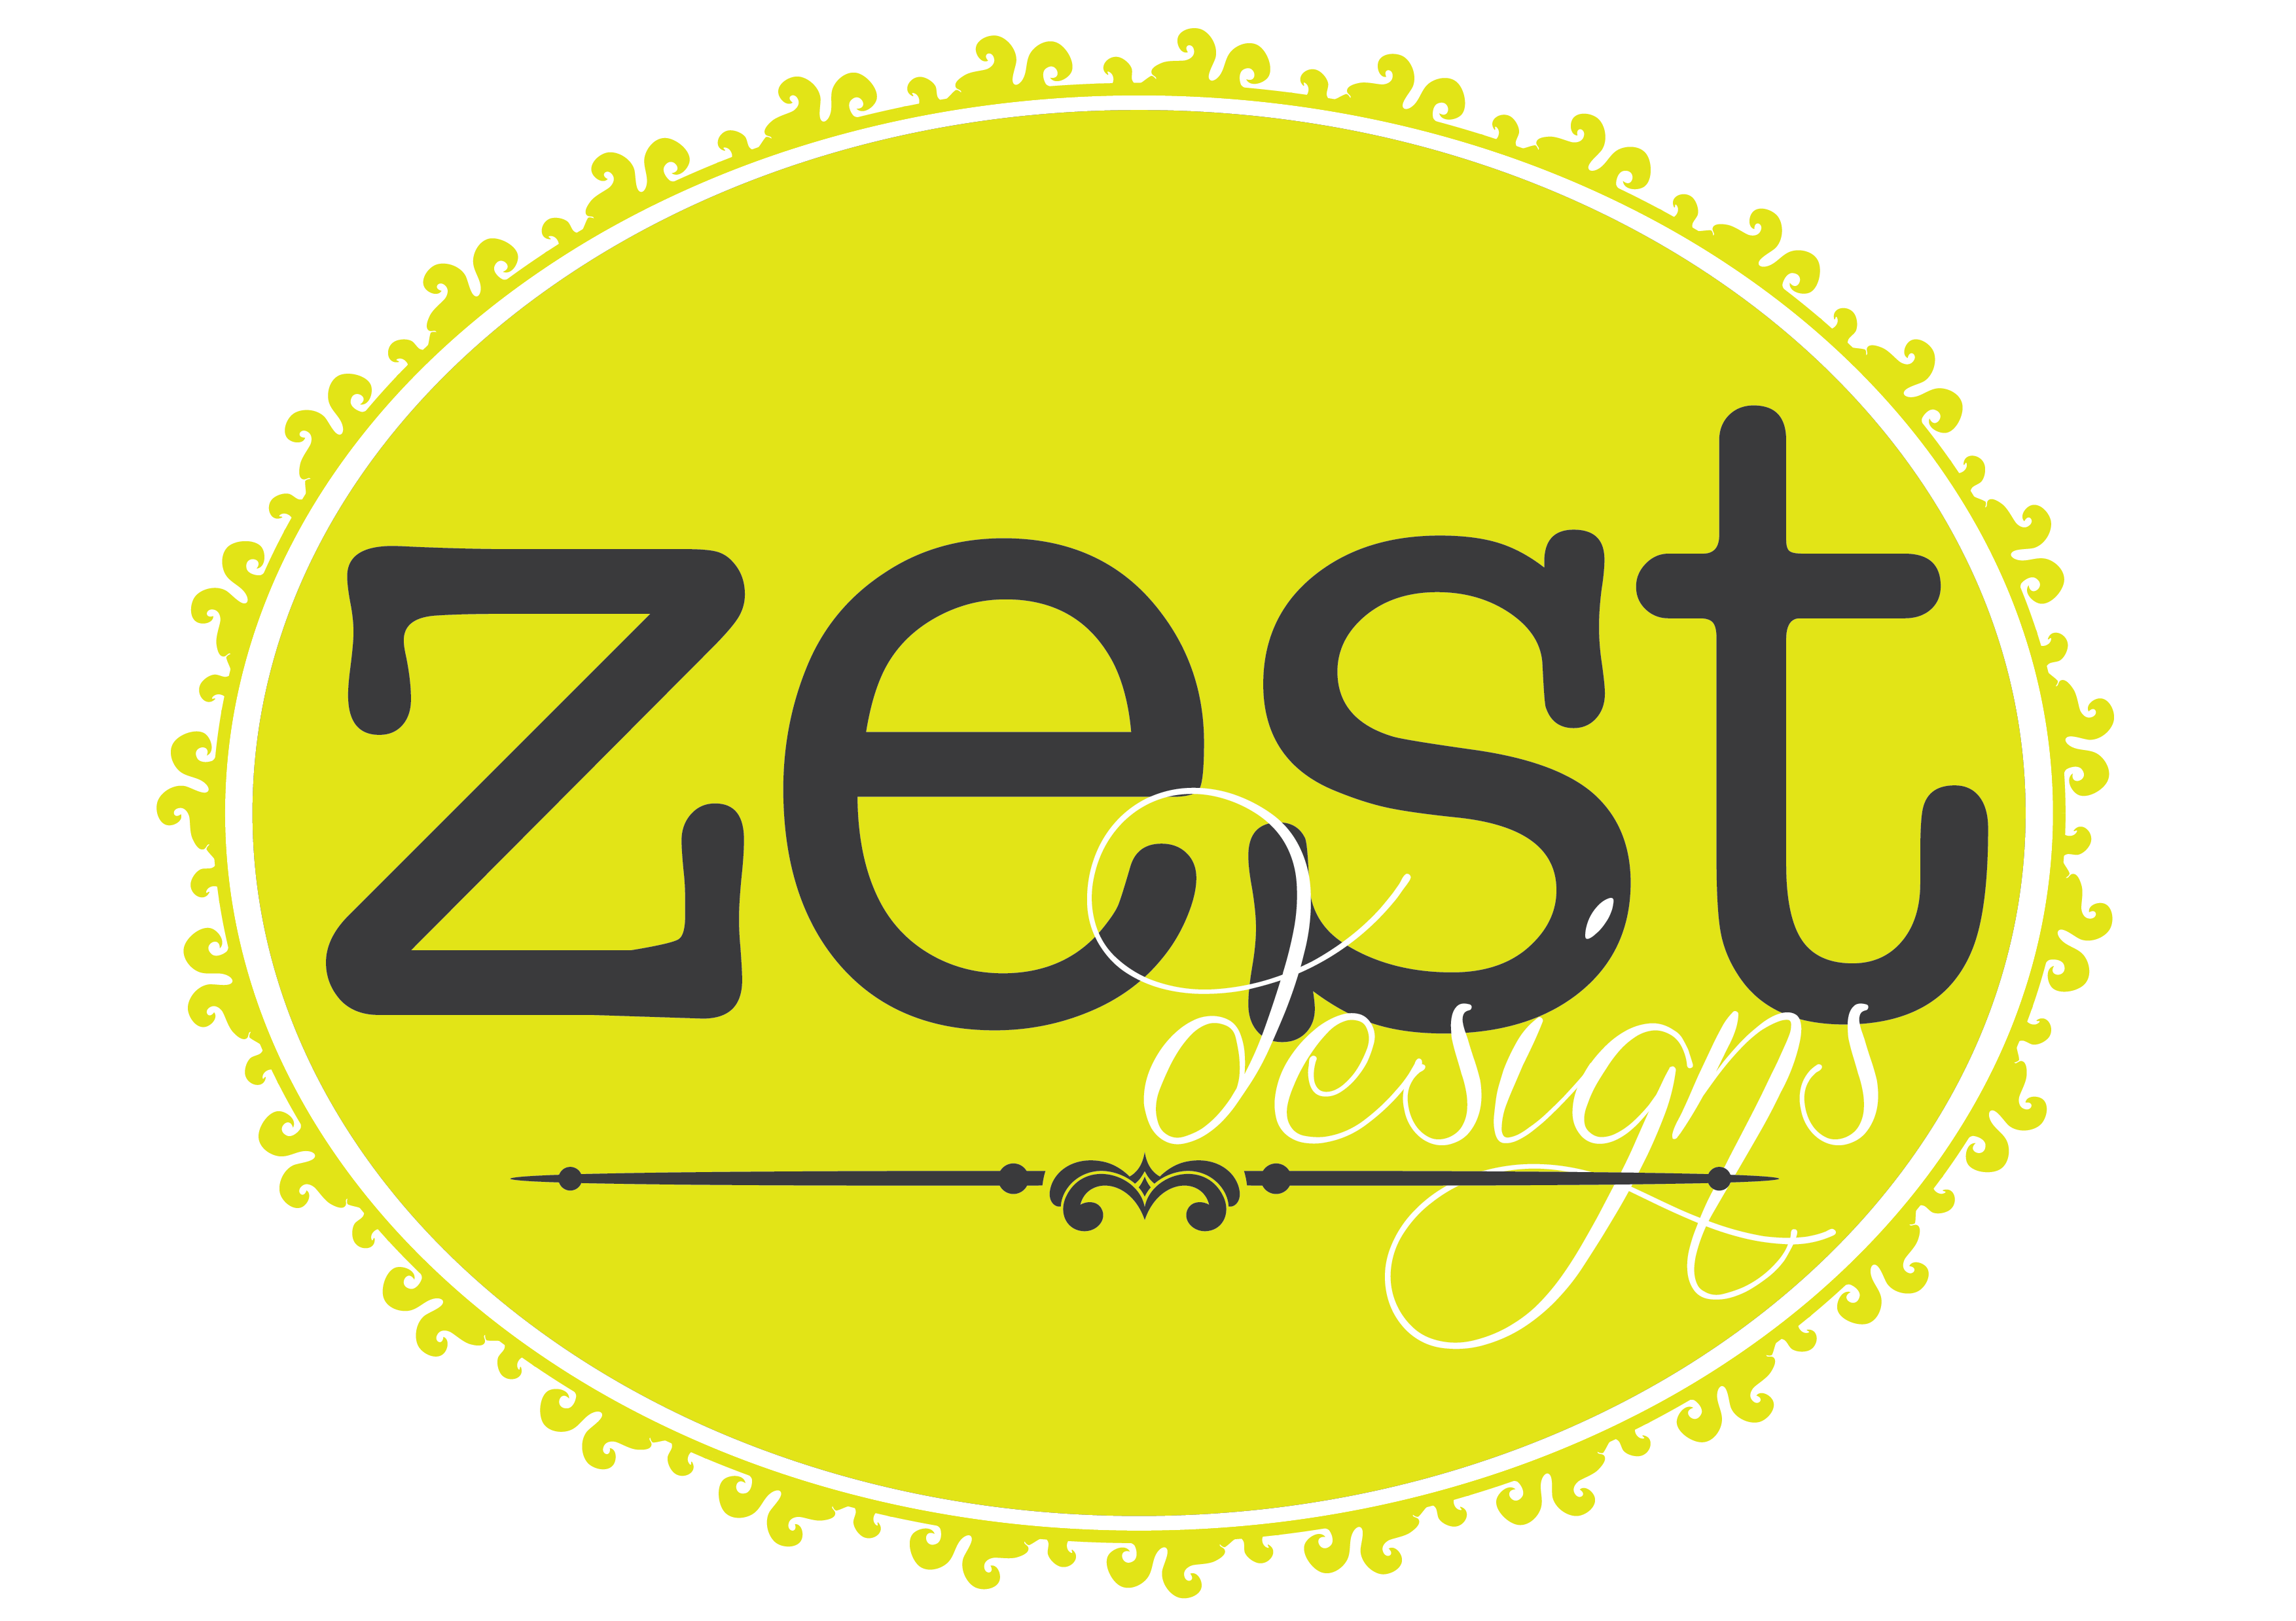 Zest Designs